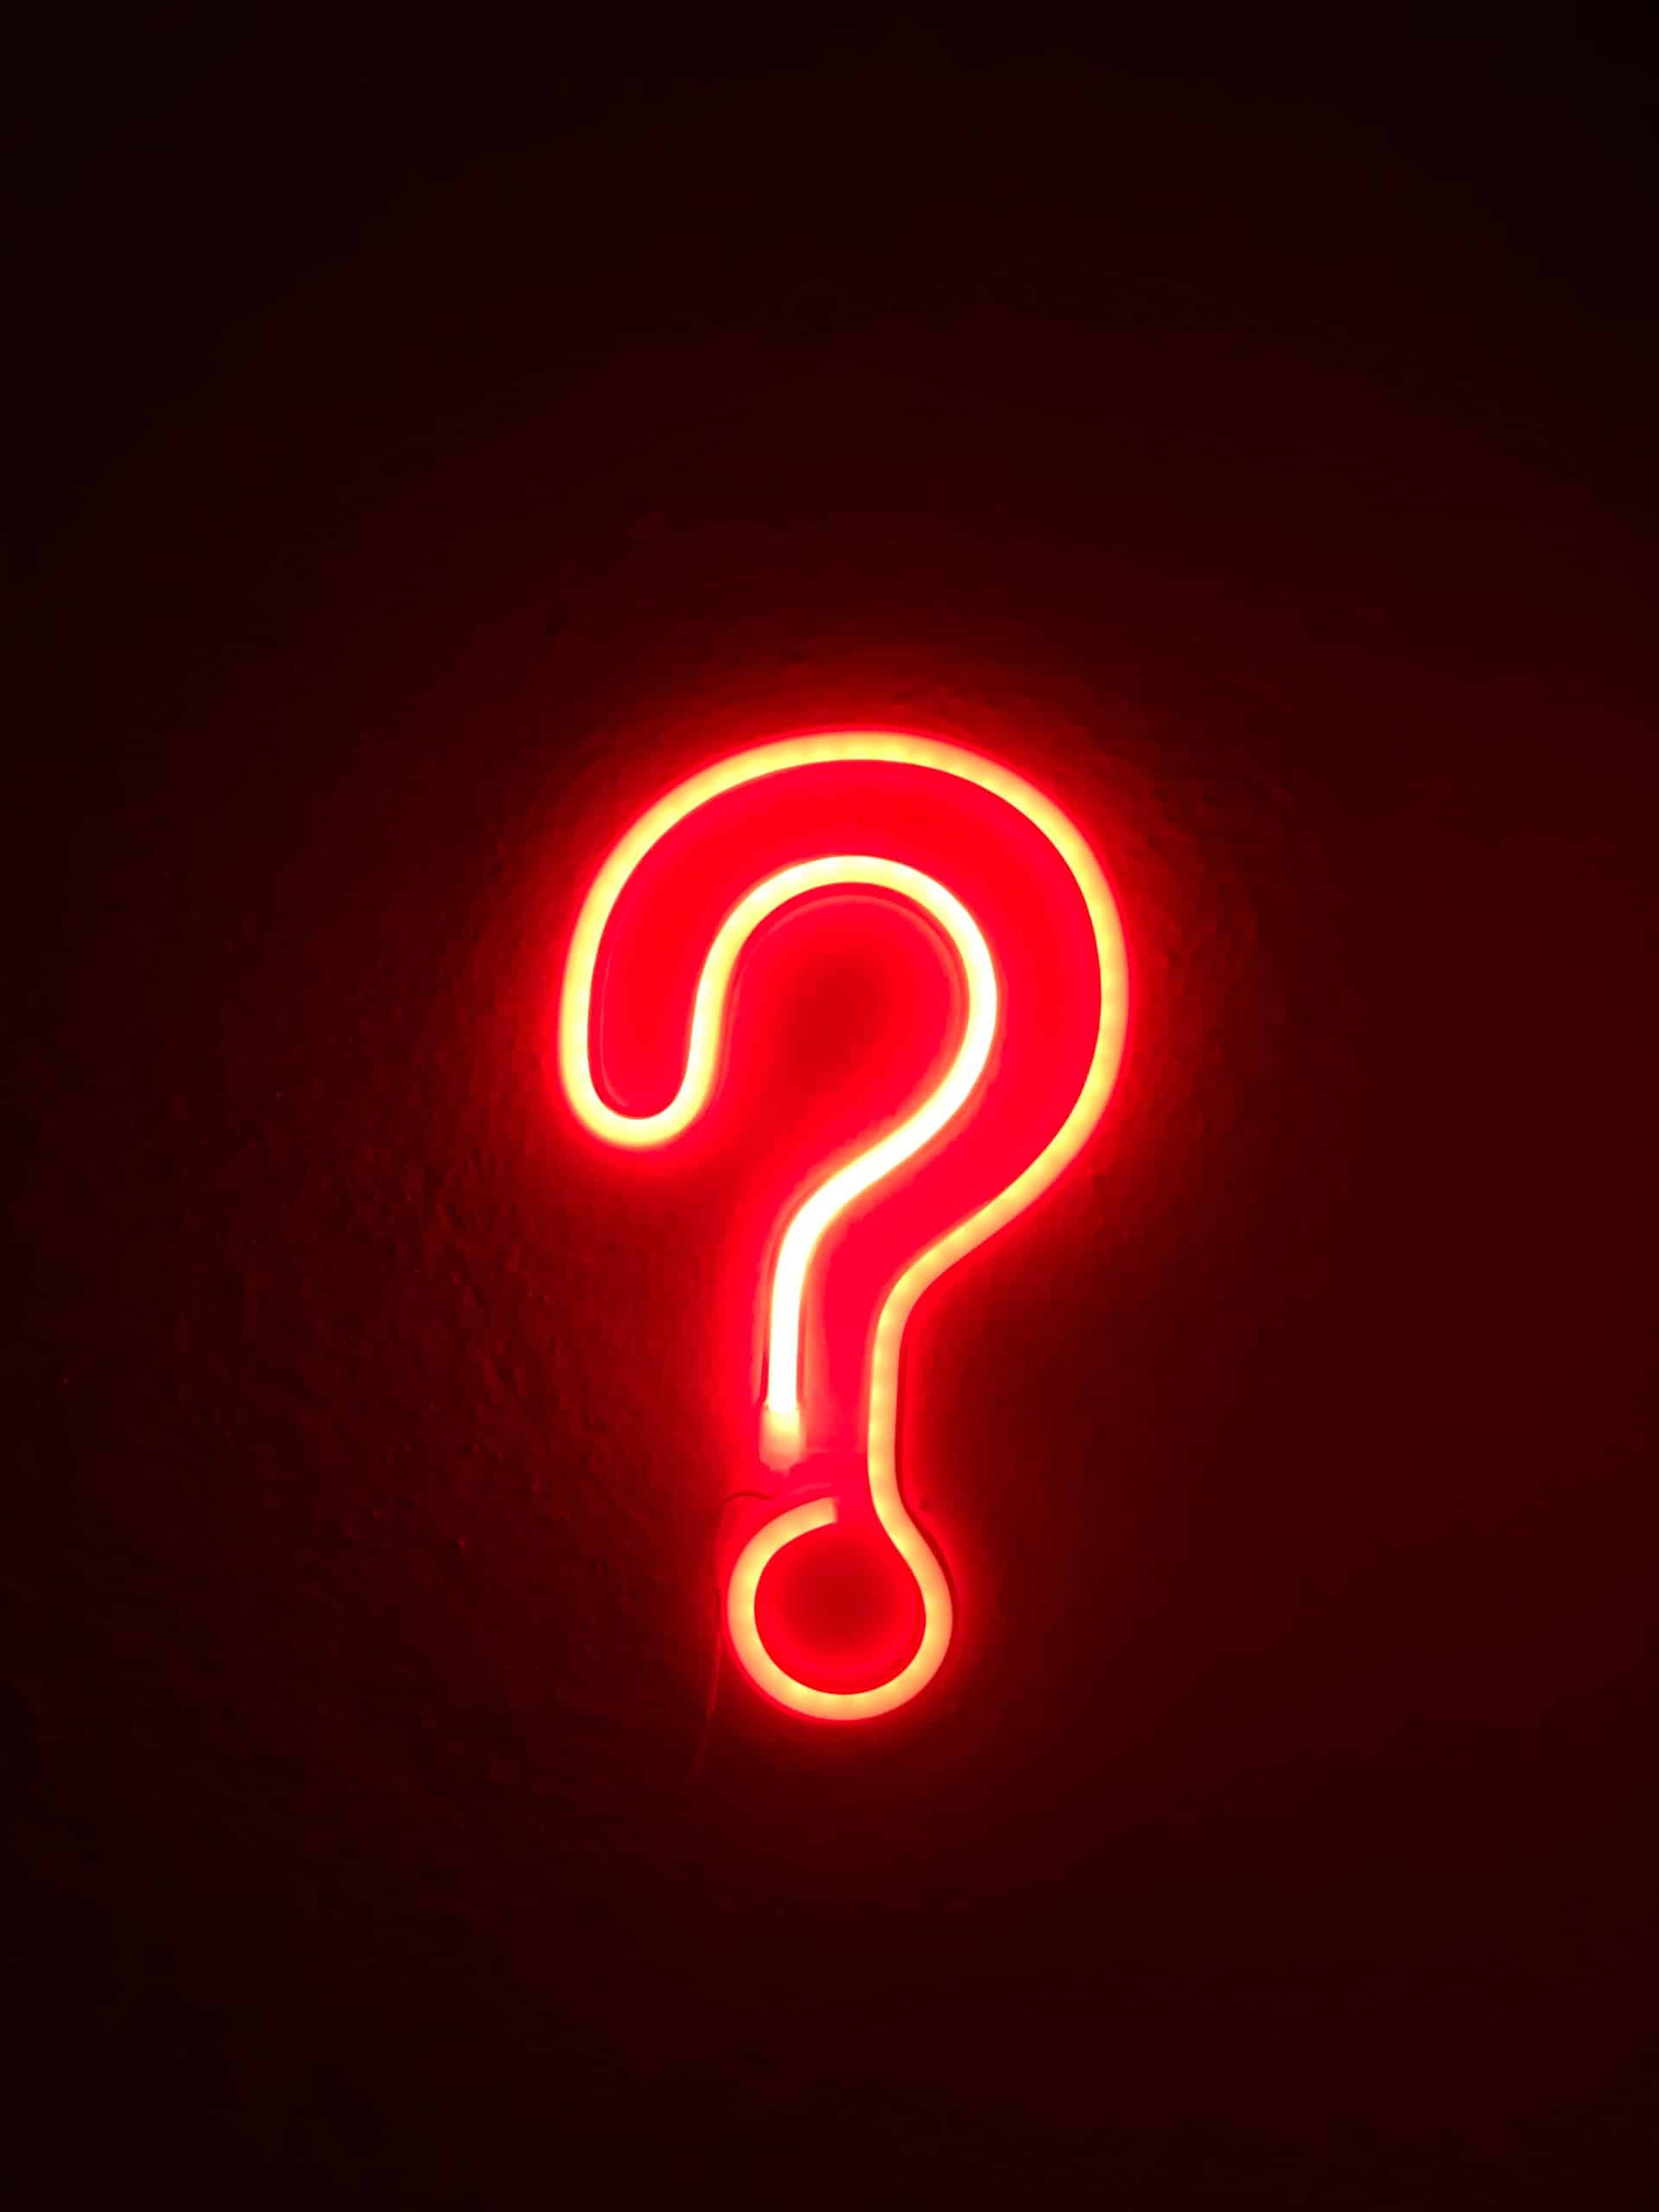 Neon question